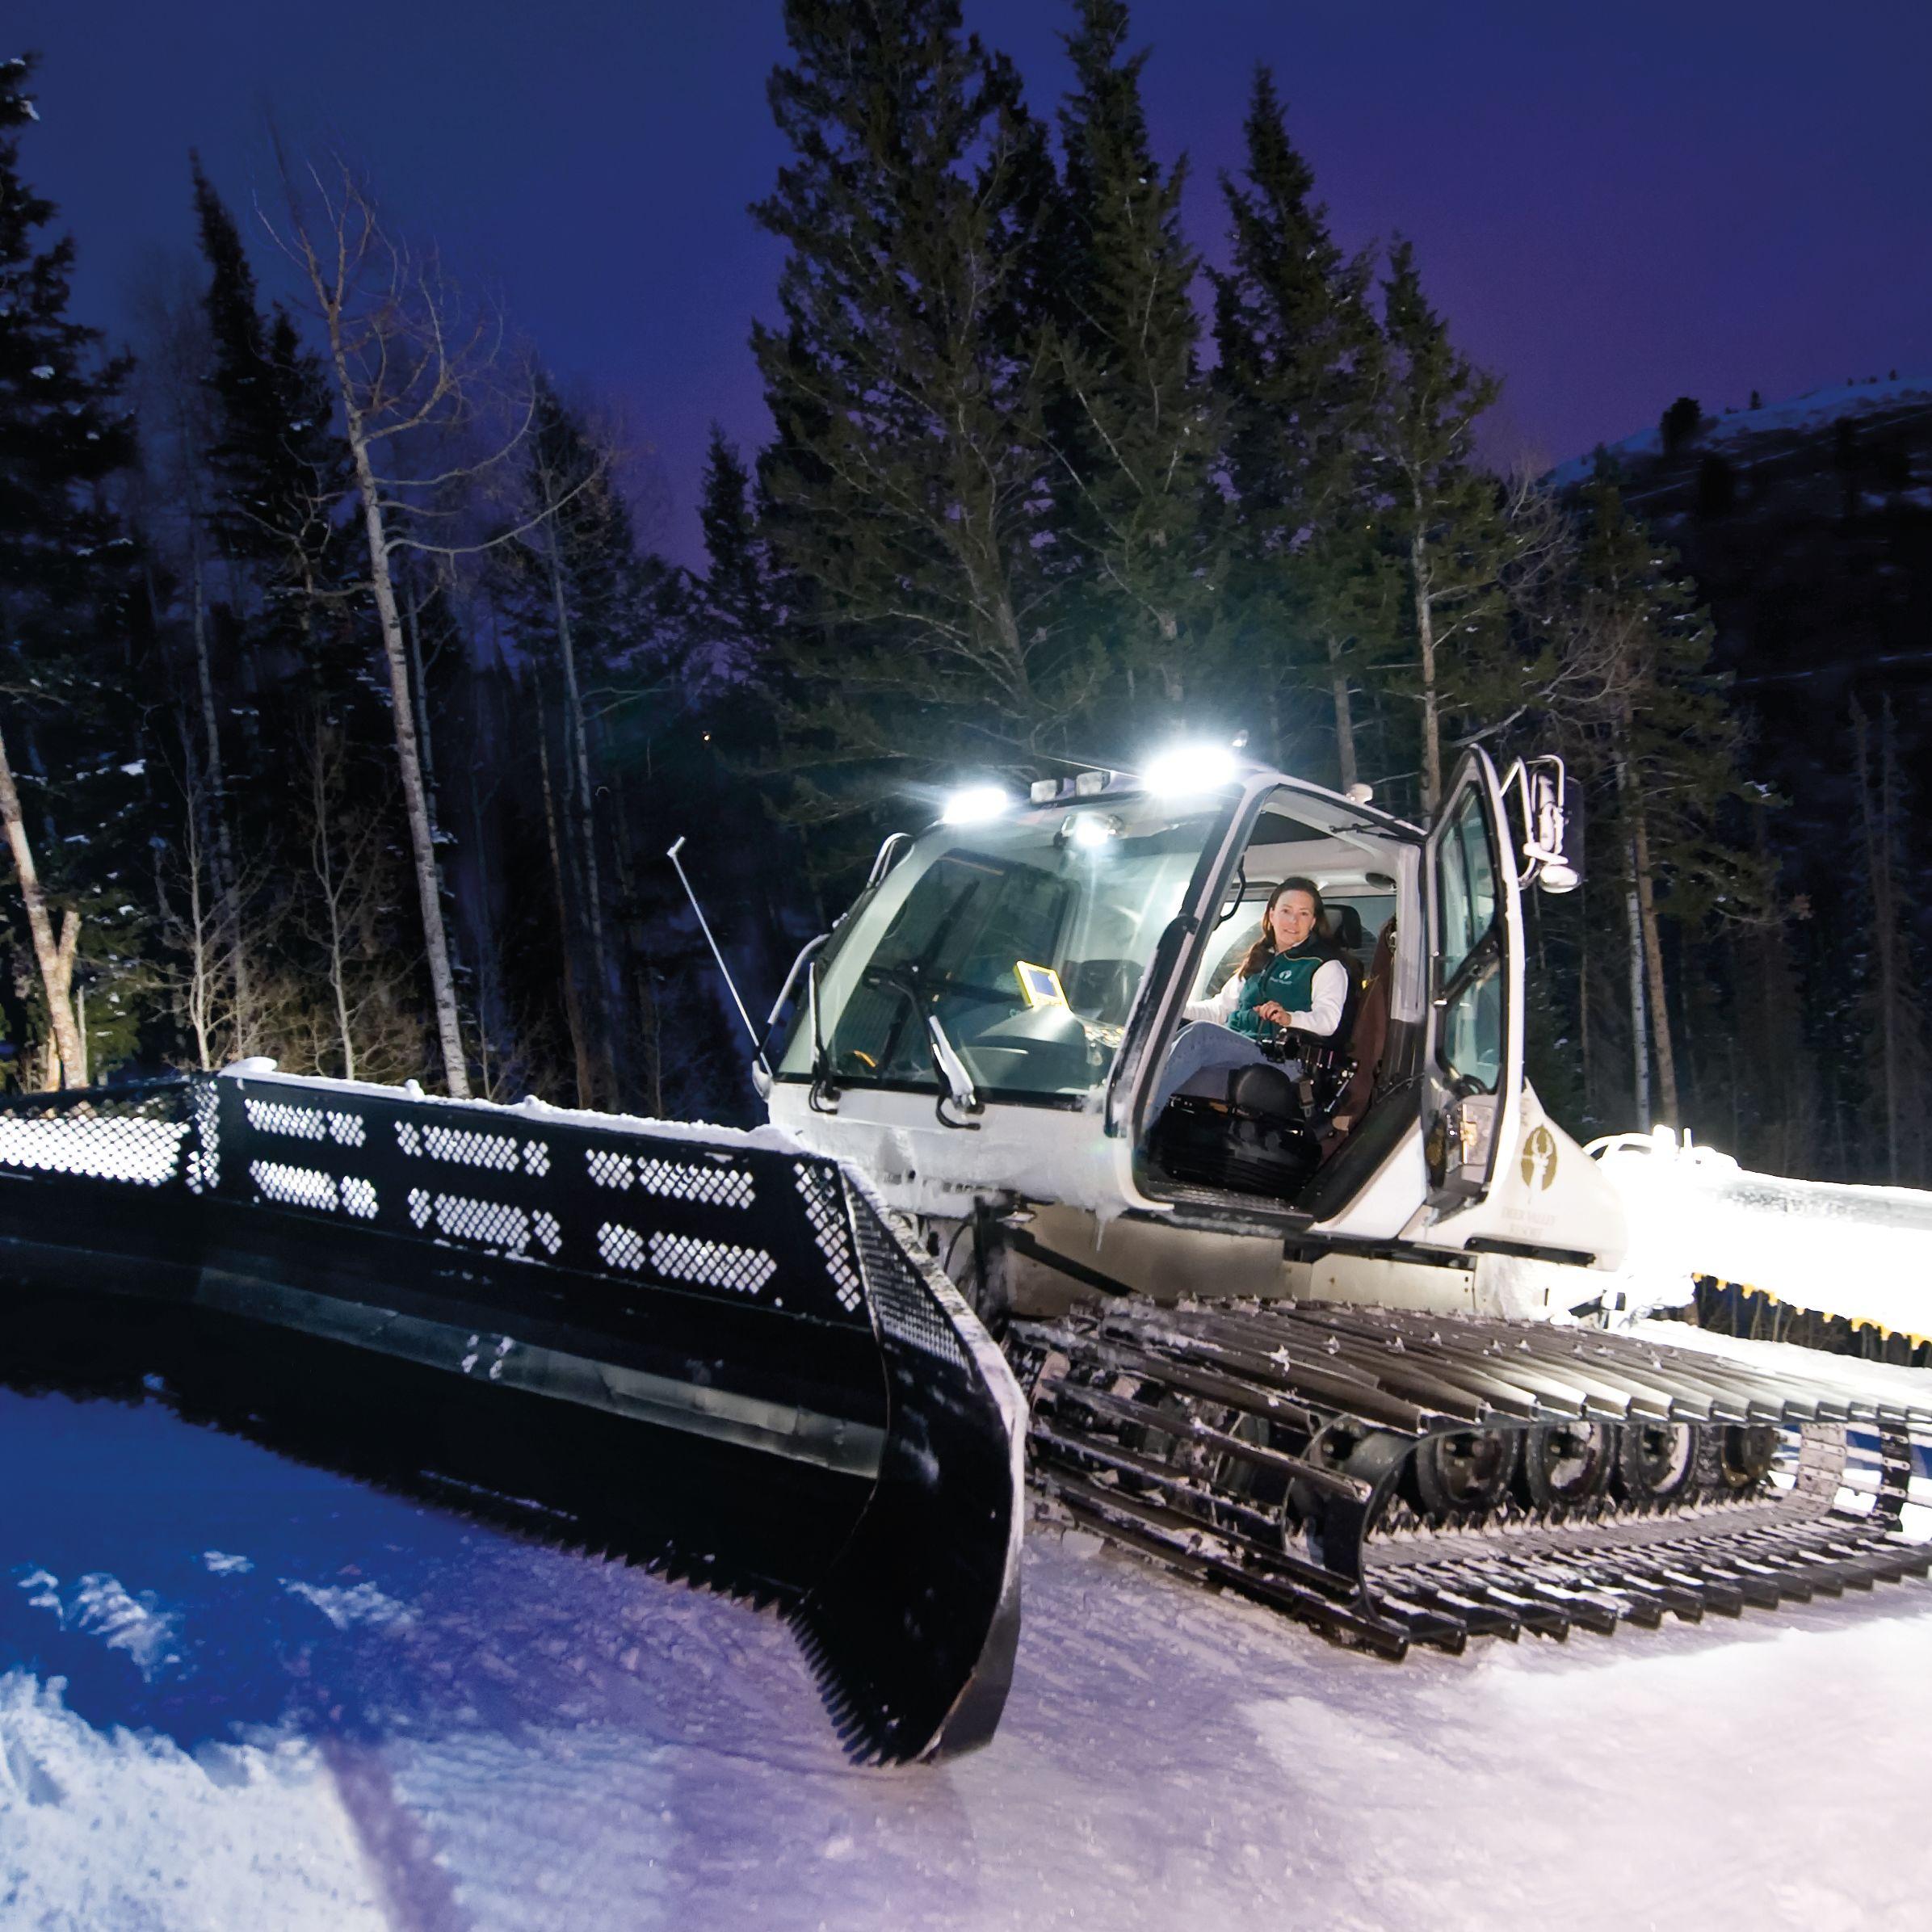 Pcwi 14 laura sexton ski groomer pt5tj5